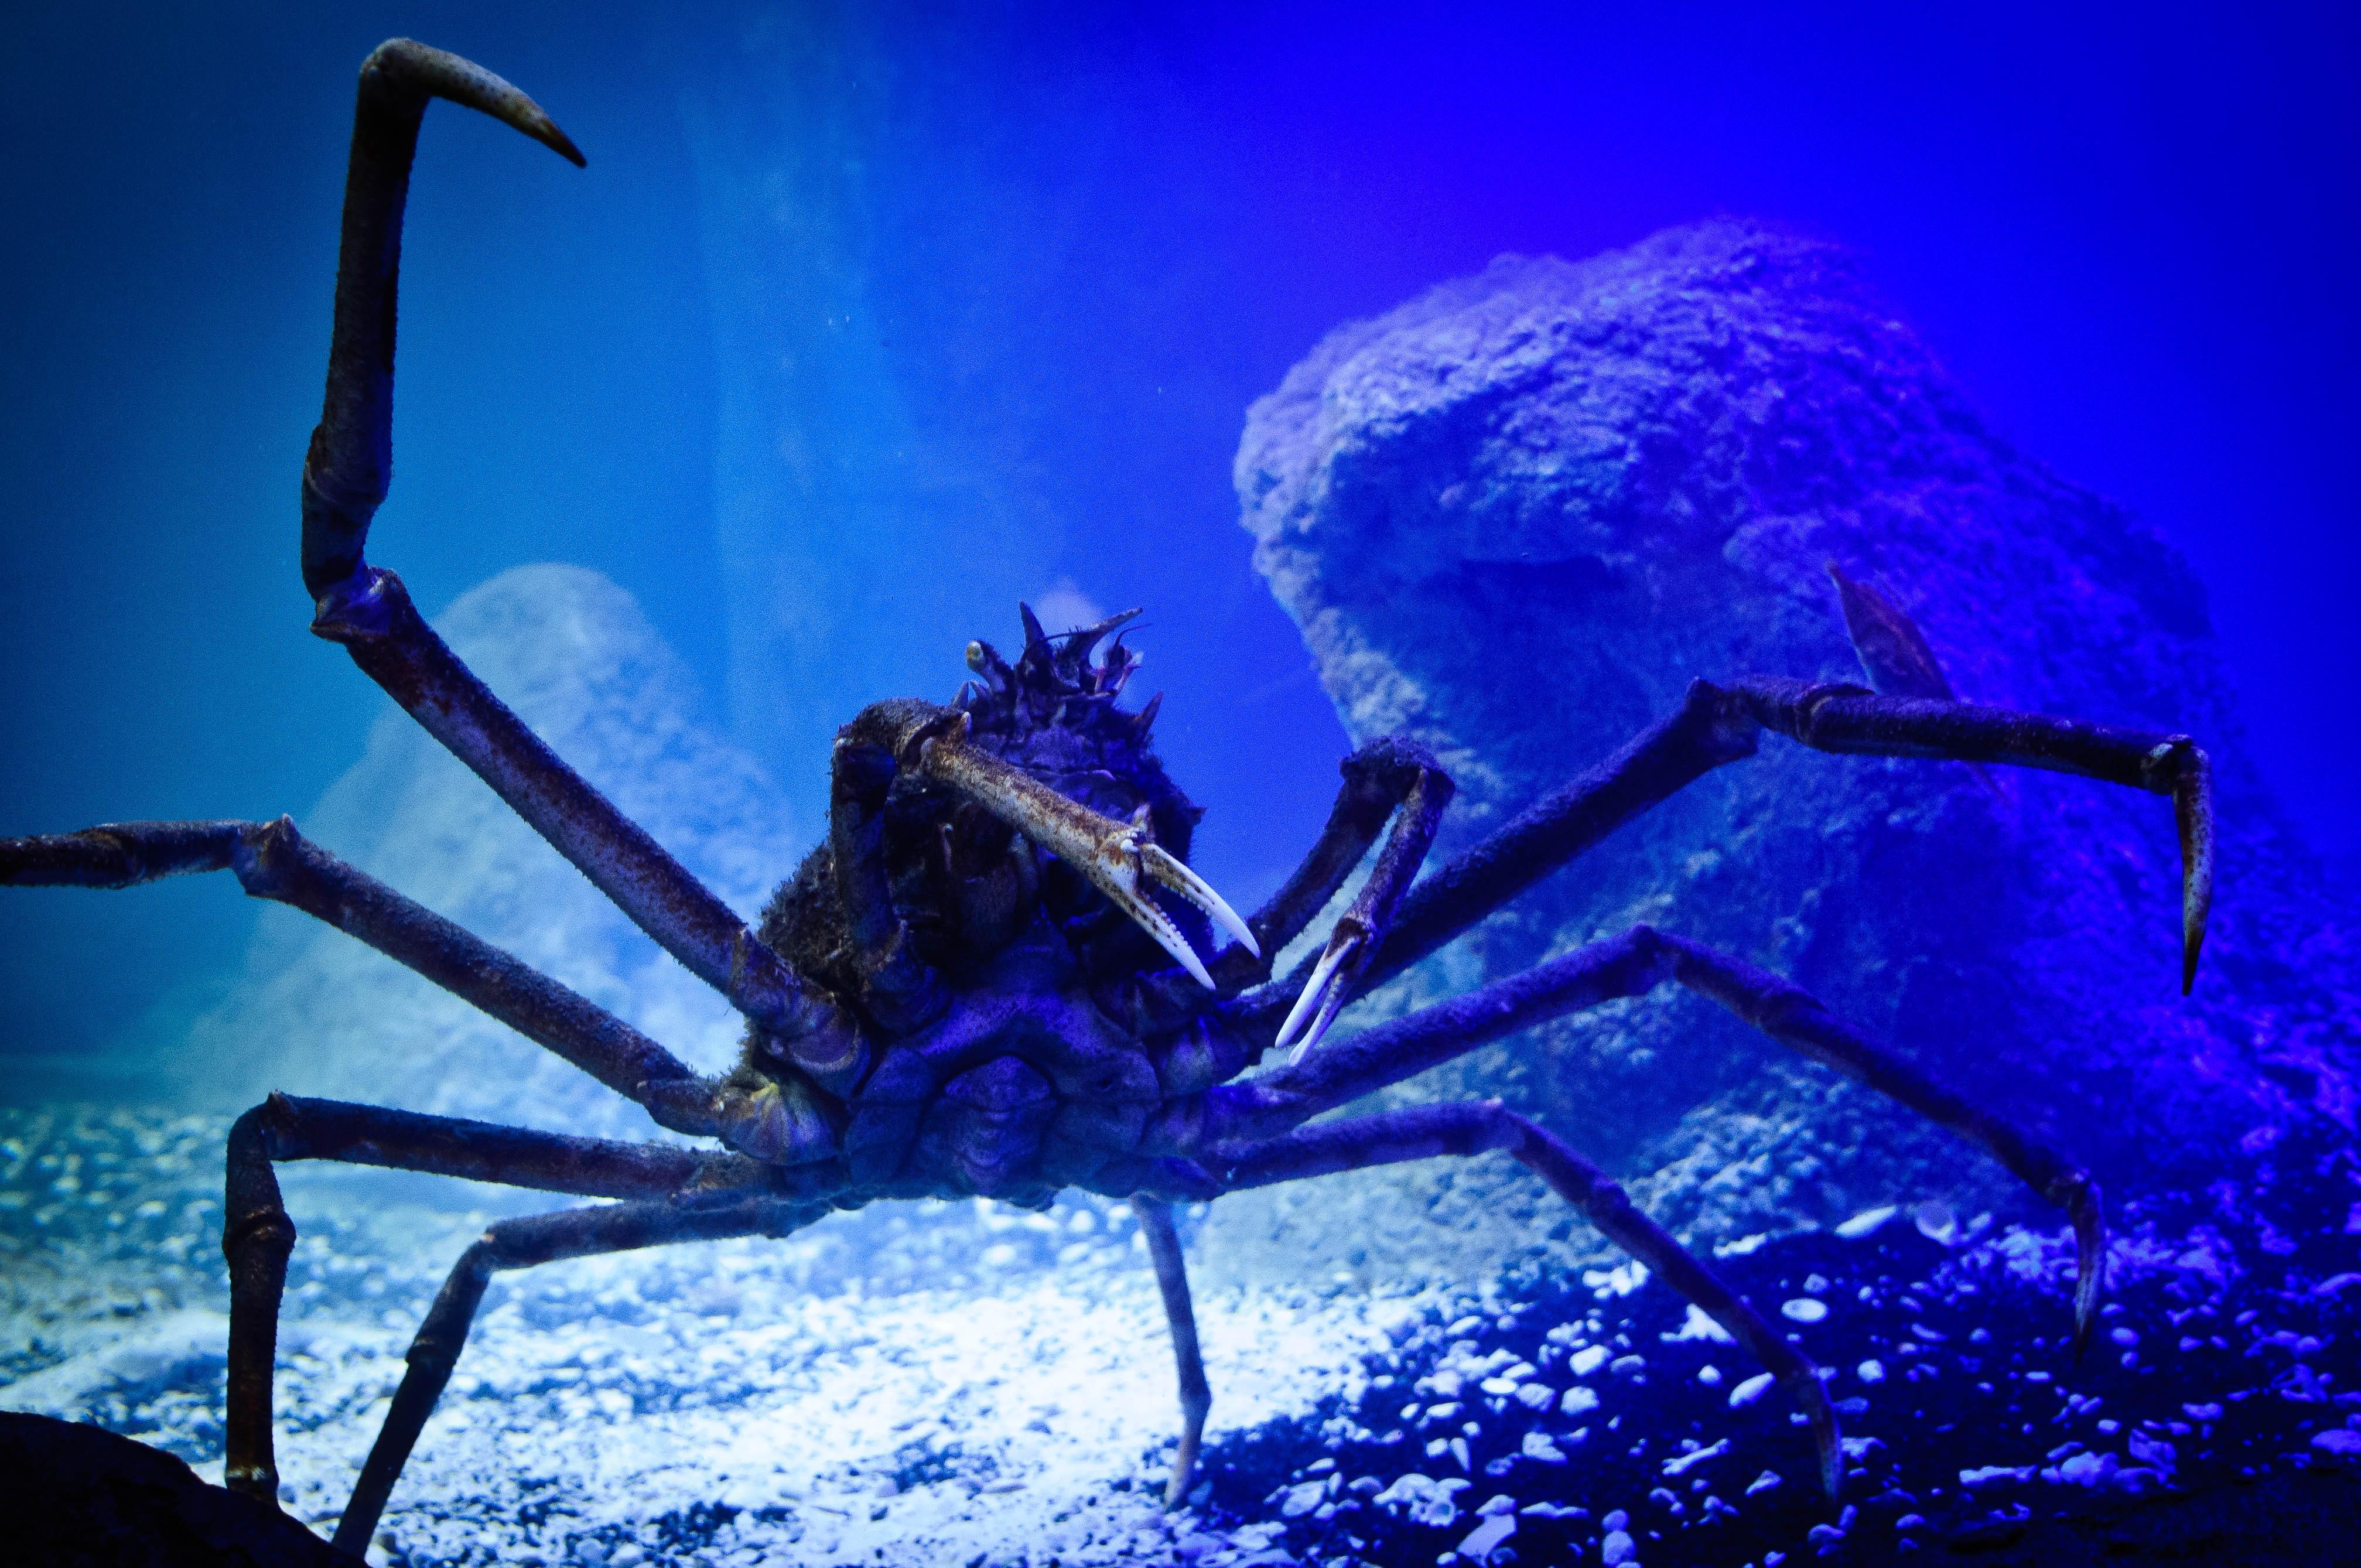 free images  water animal underwater invertebrate